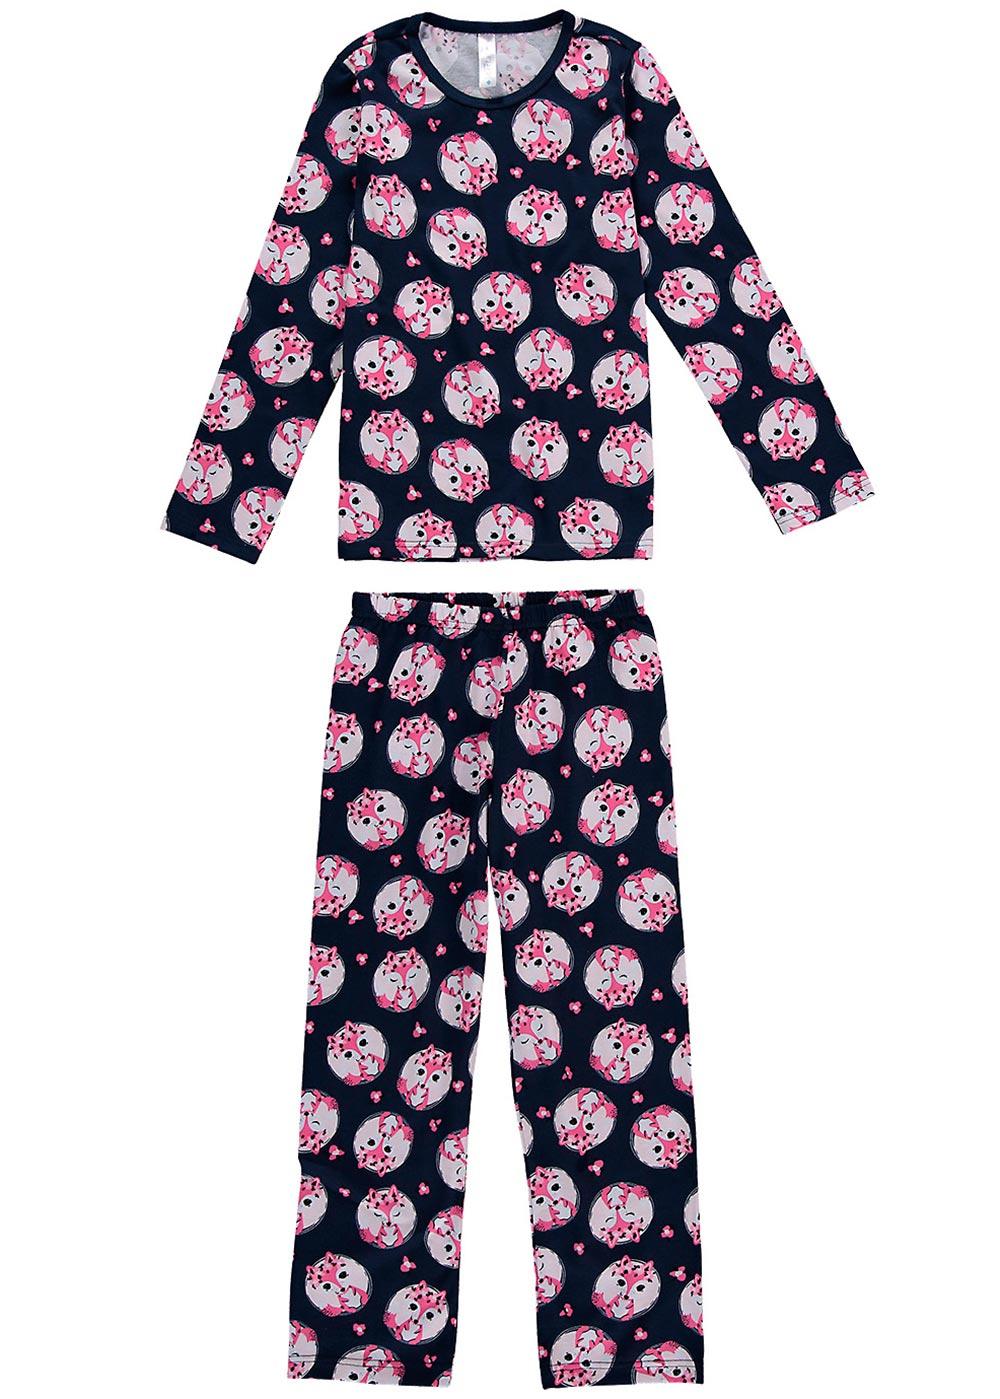 Pijama Infantil Feminino Inverno Azul Fox - Malwee